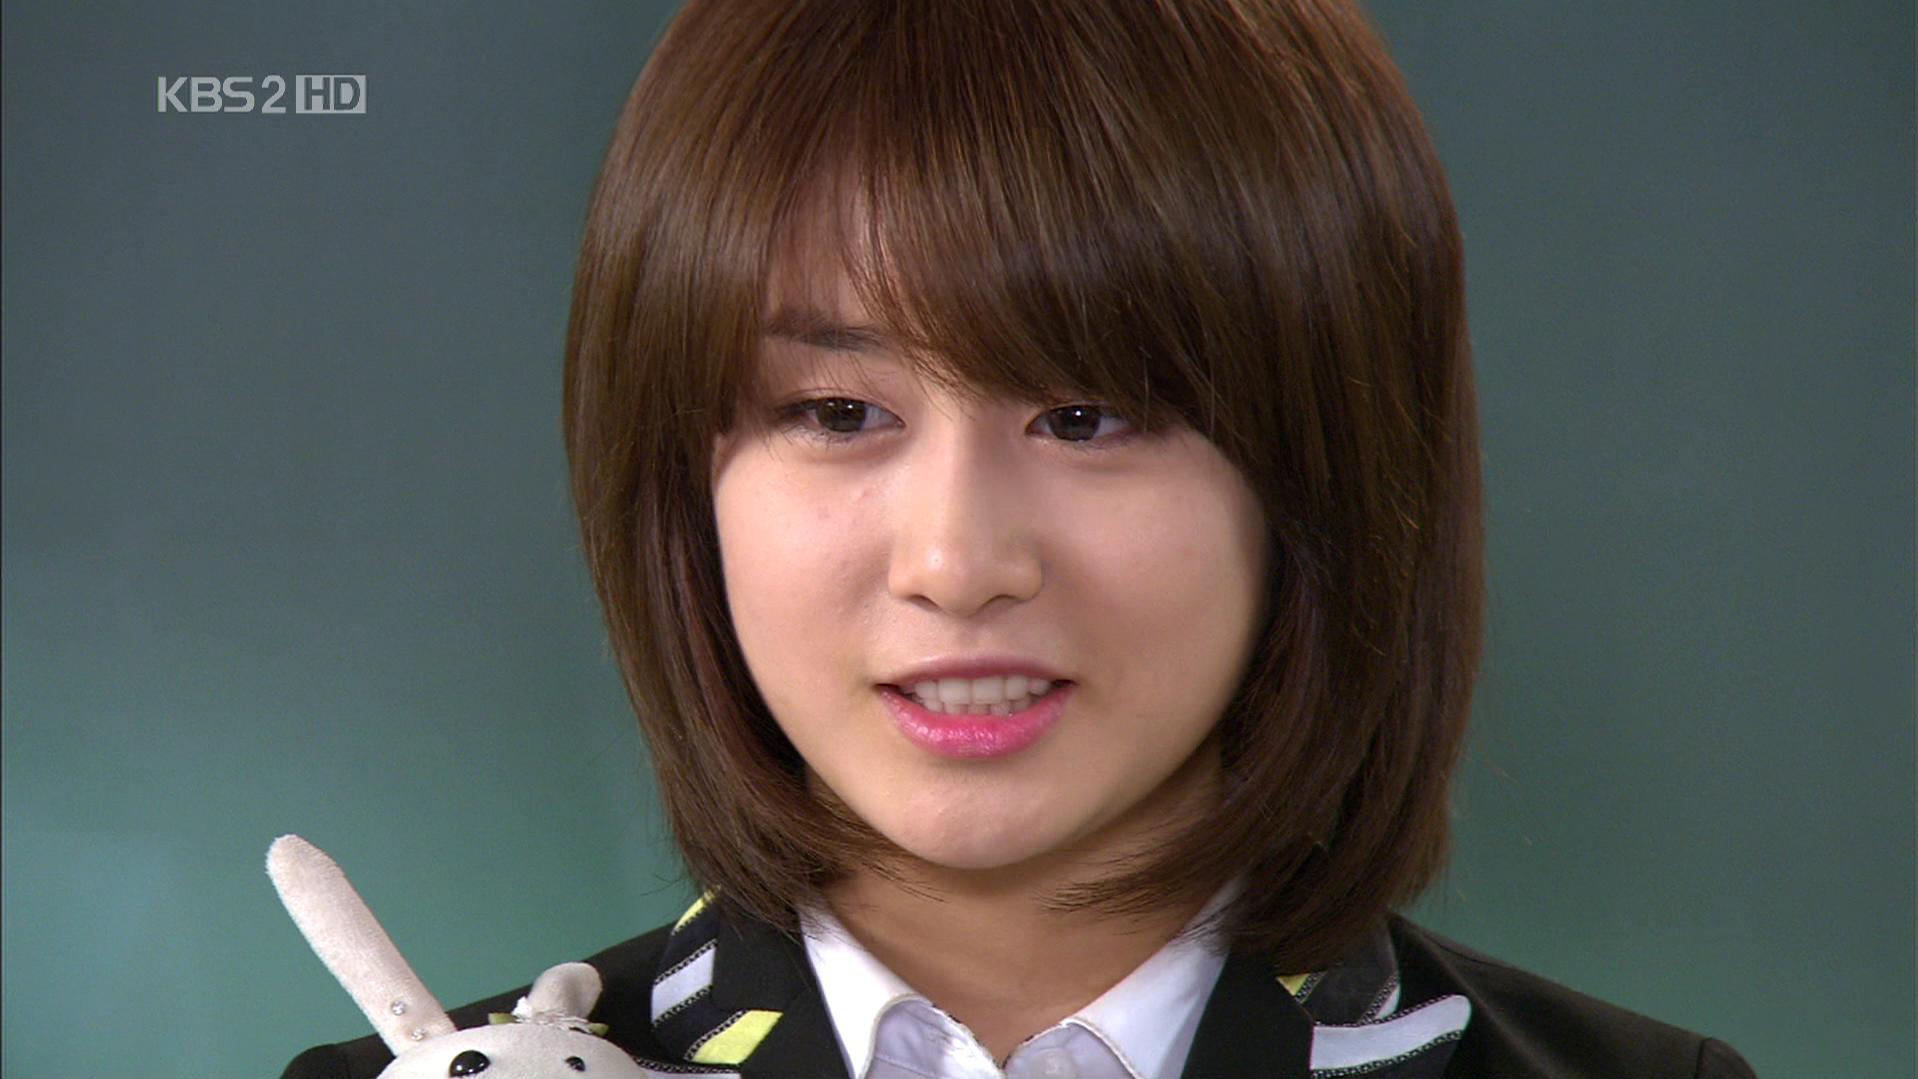 Wondrous Who Get The Best Look With Short Hairstyle Girls Generation Short Hairstyles Gunalazisus